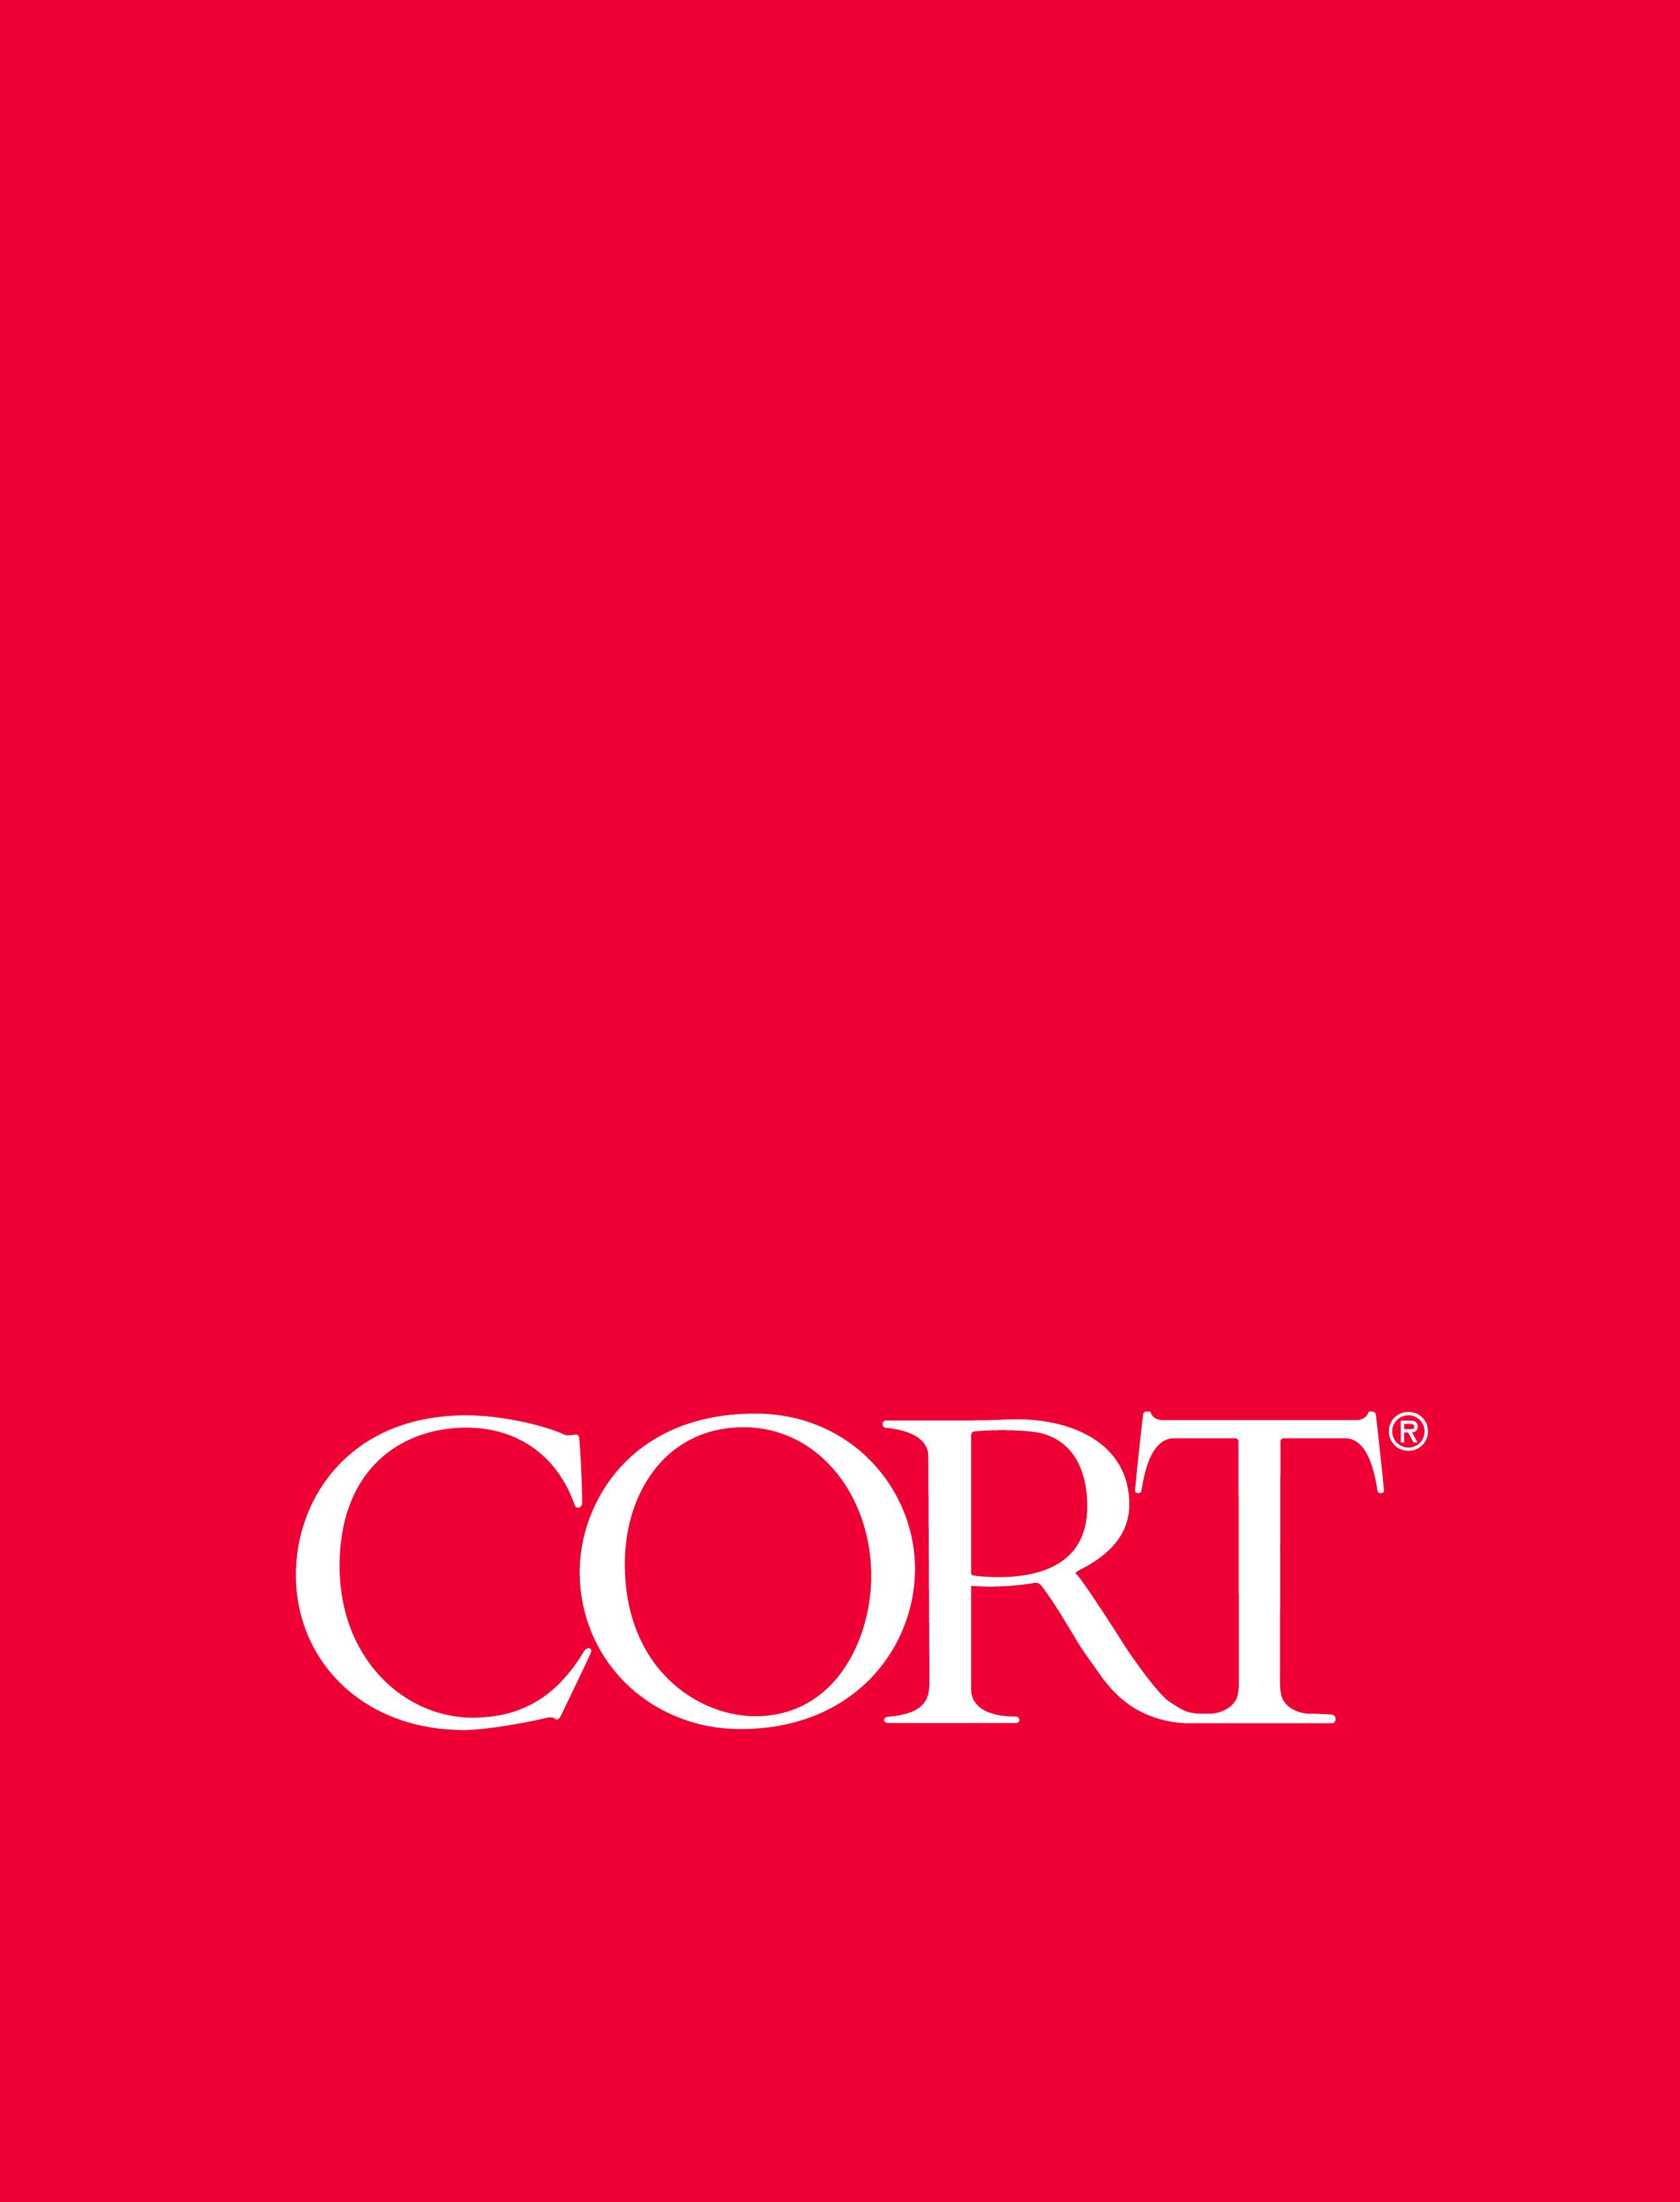 _CORT_notag_Logo_RGB.jpg